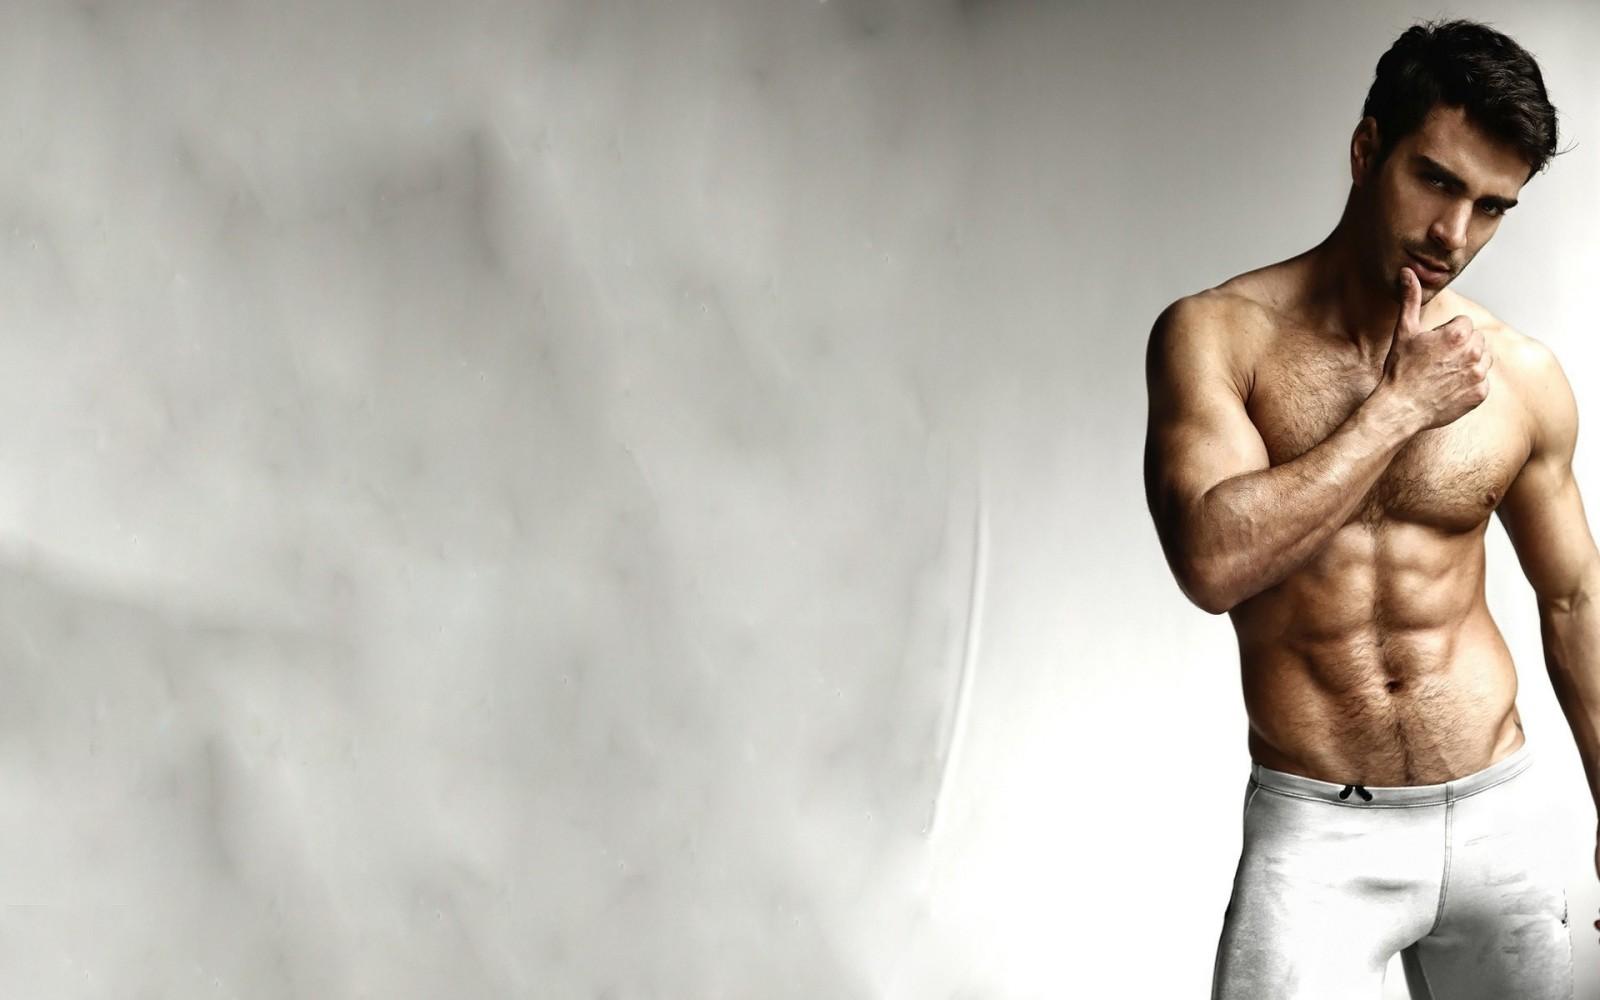 Tattoos Men Abs Trunks Pecs Muscle Gay Wallpaper